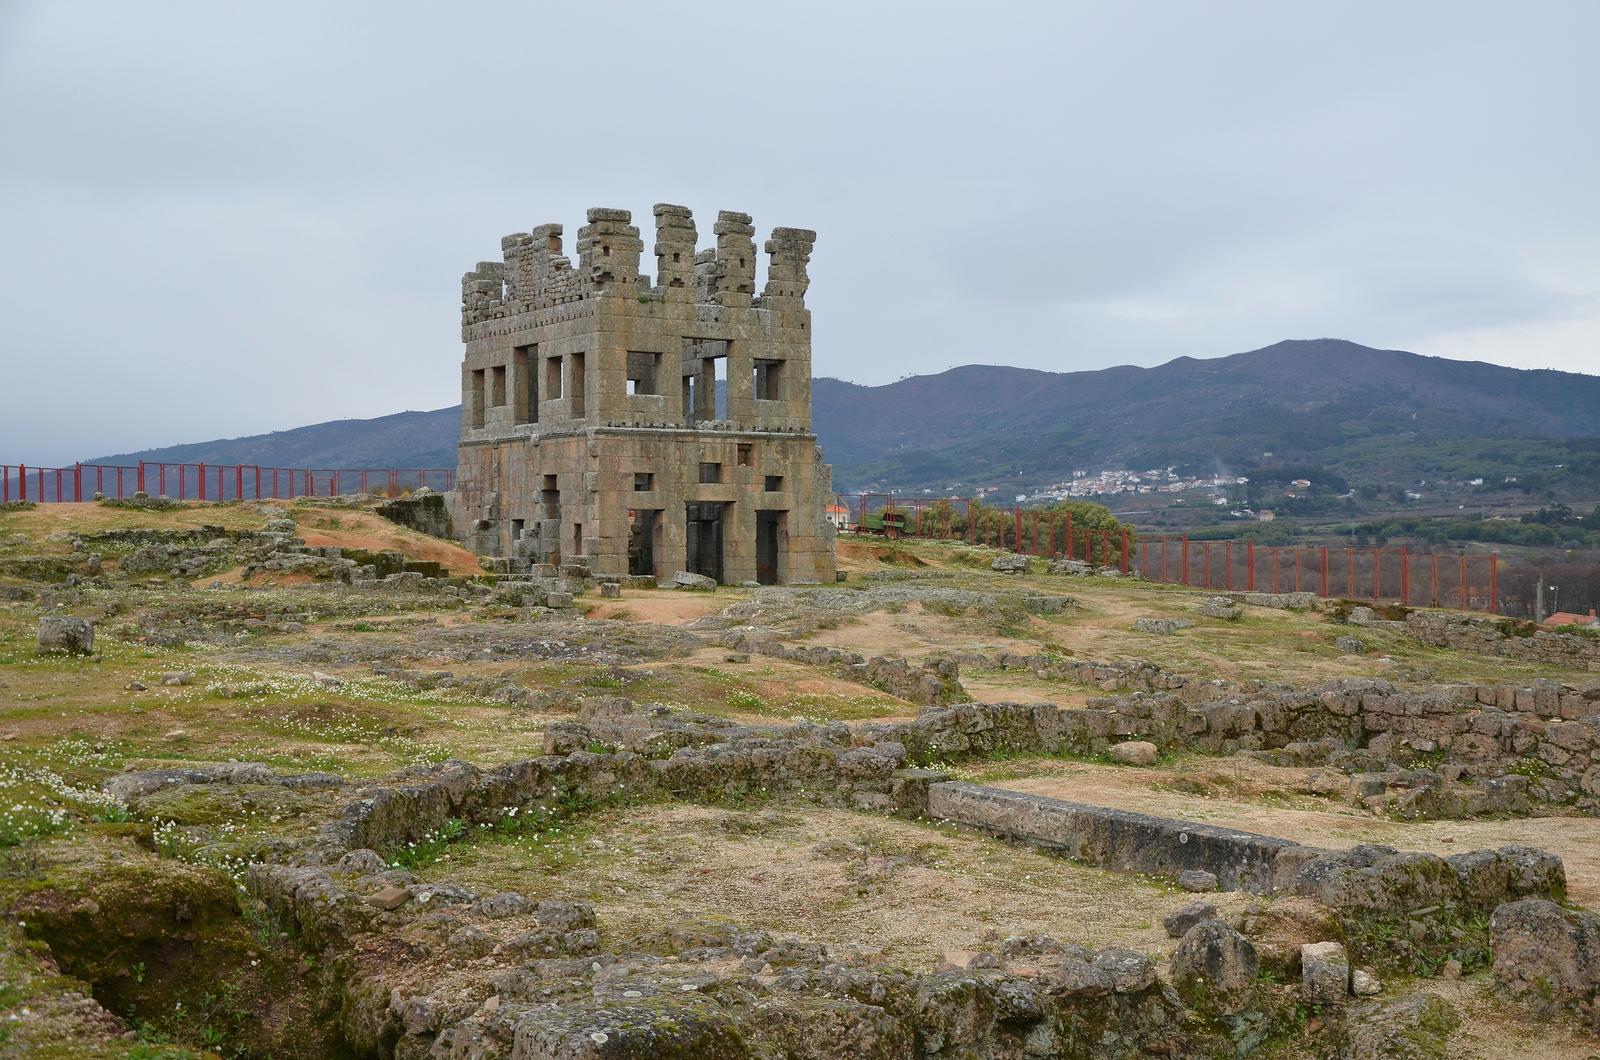 Belmonte Portugal  city images : Roman tower of Centum Cellas, Belmonte, Portugal © Carole Raddato